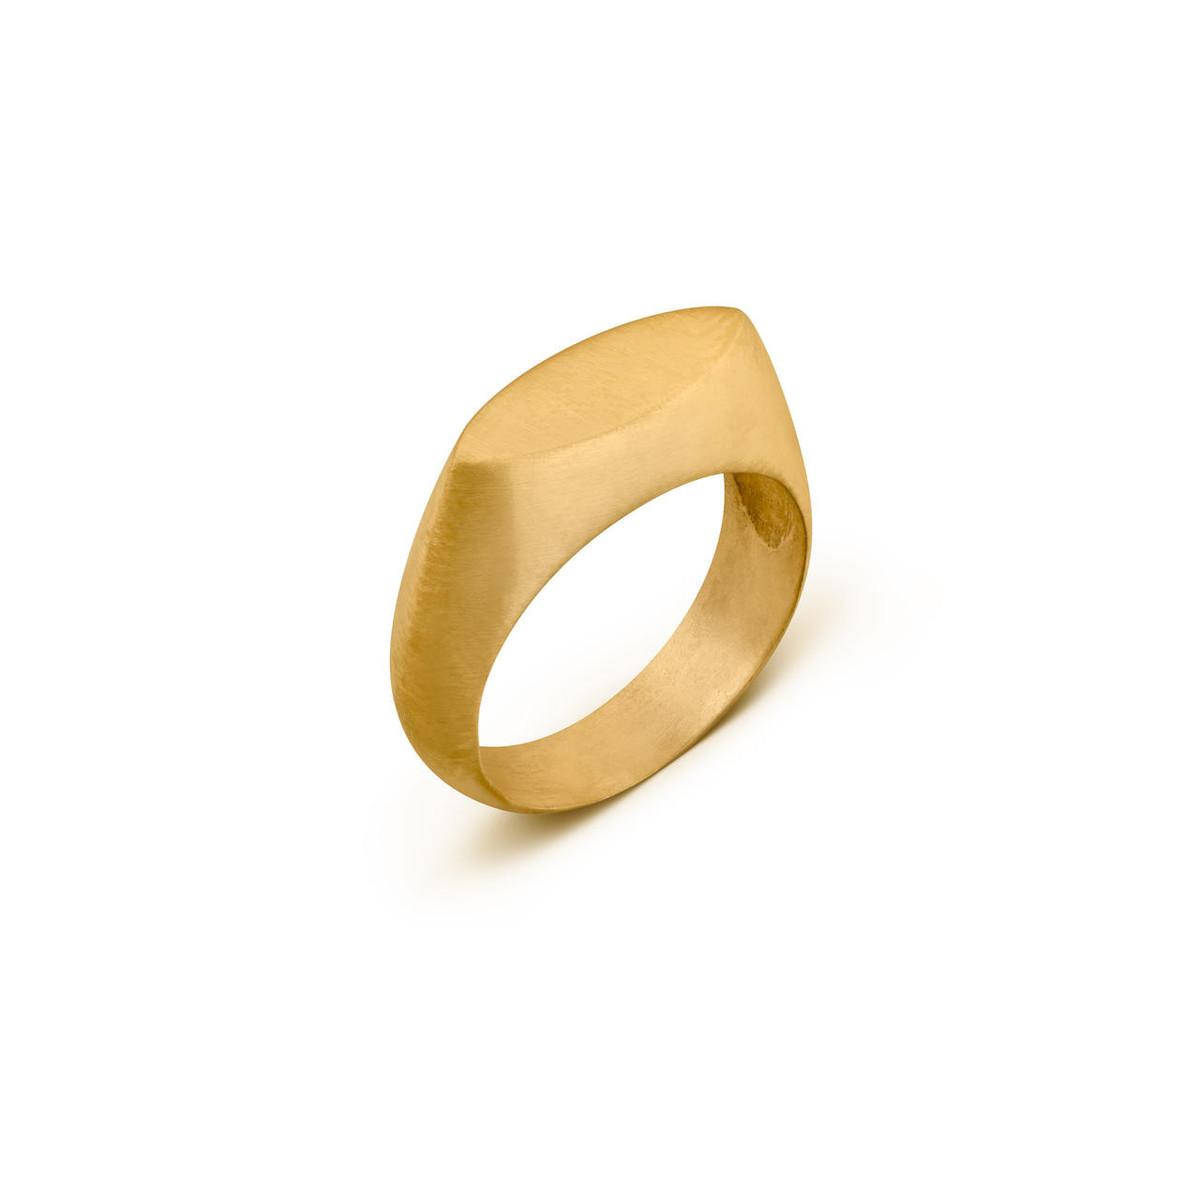 Joidart Captard Gold Ring Size 7